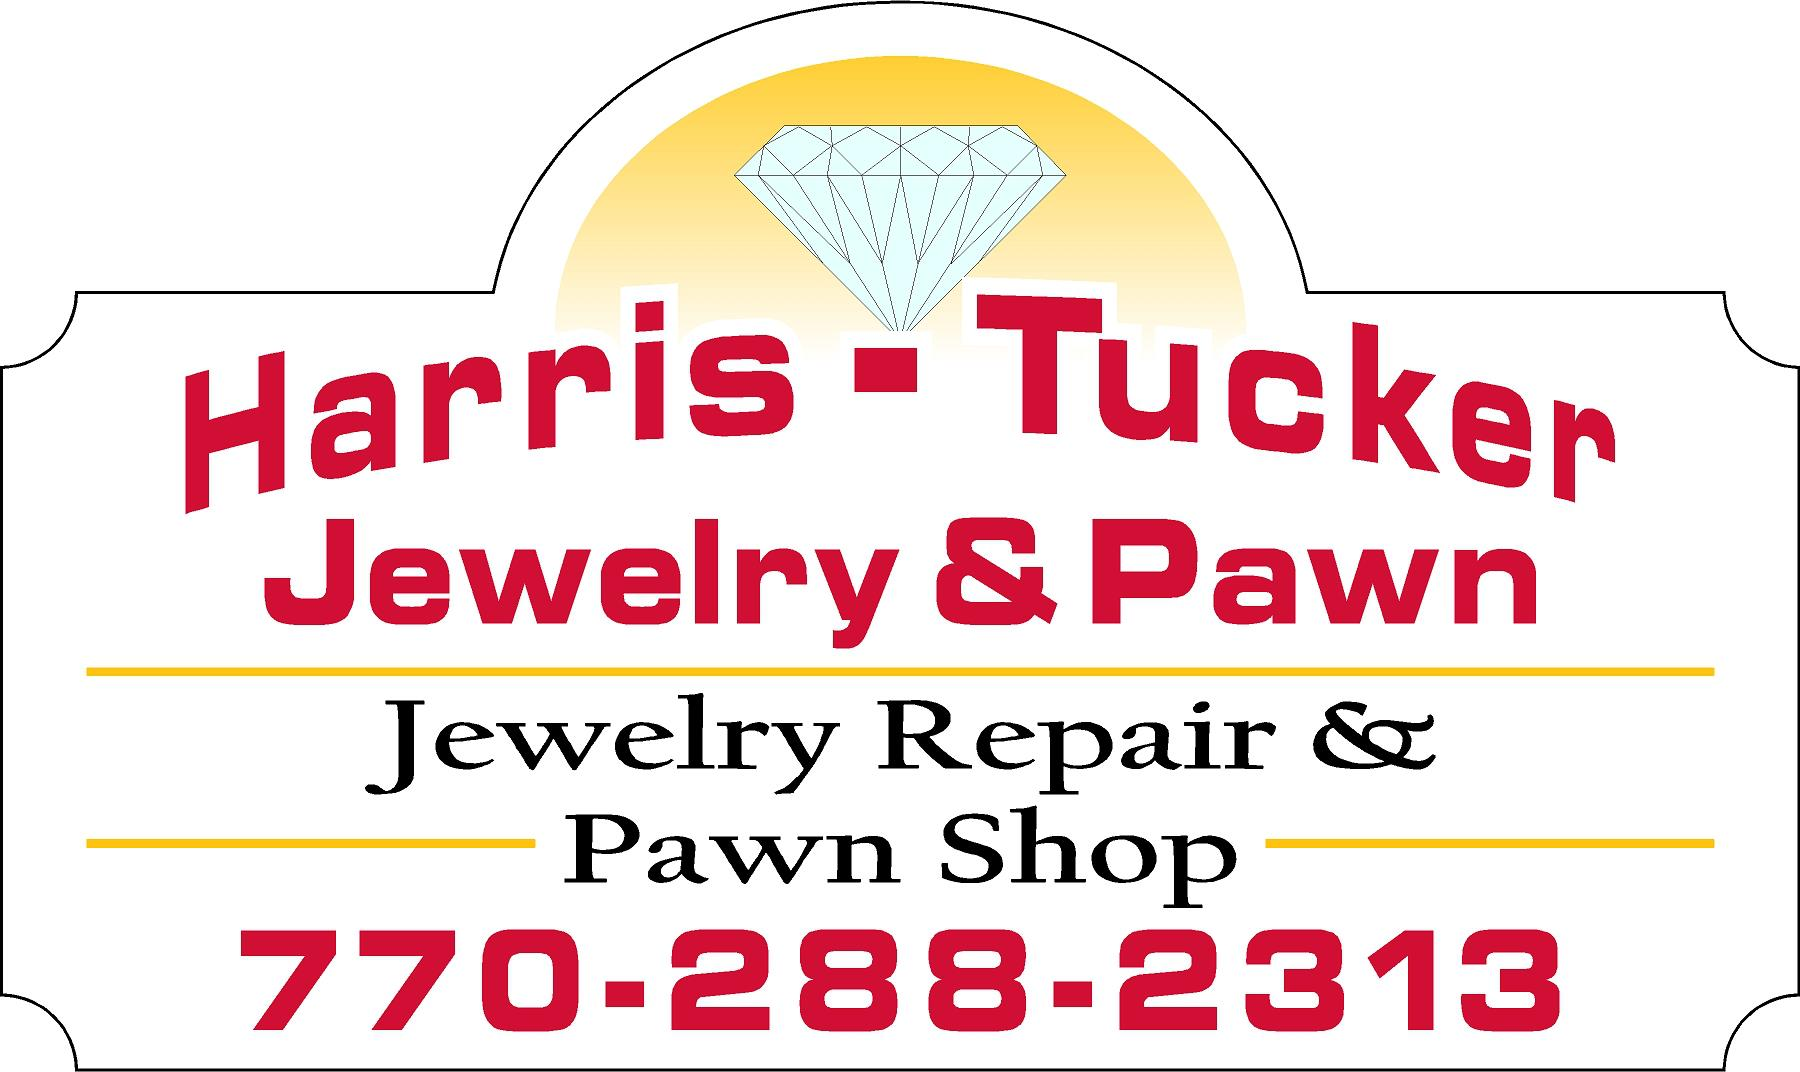 Harris – Tucker Jewelry & Pawn